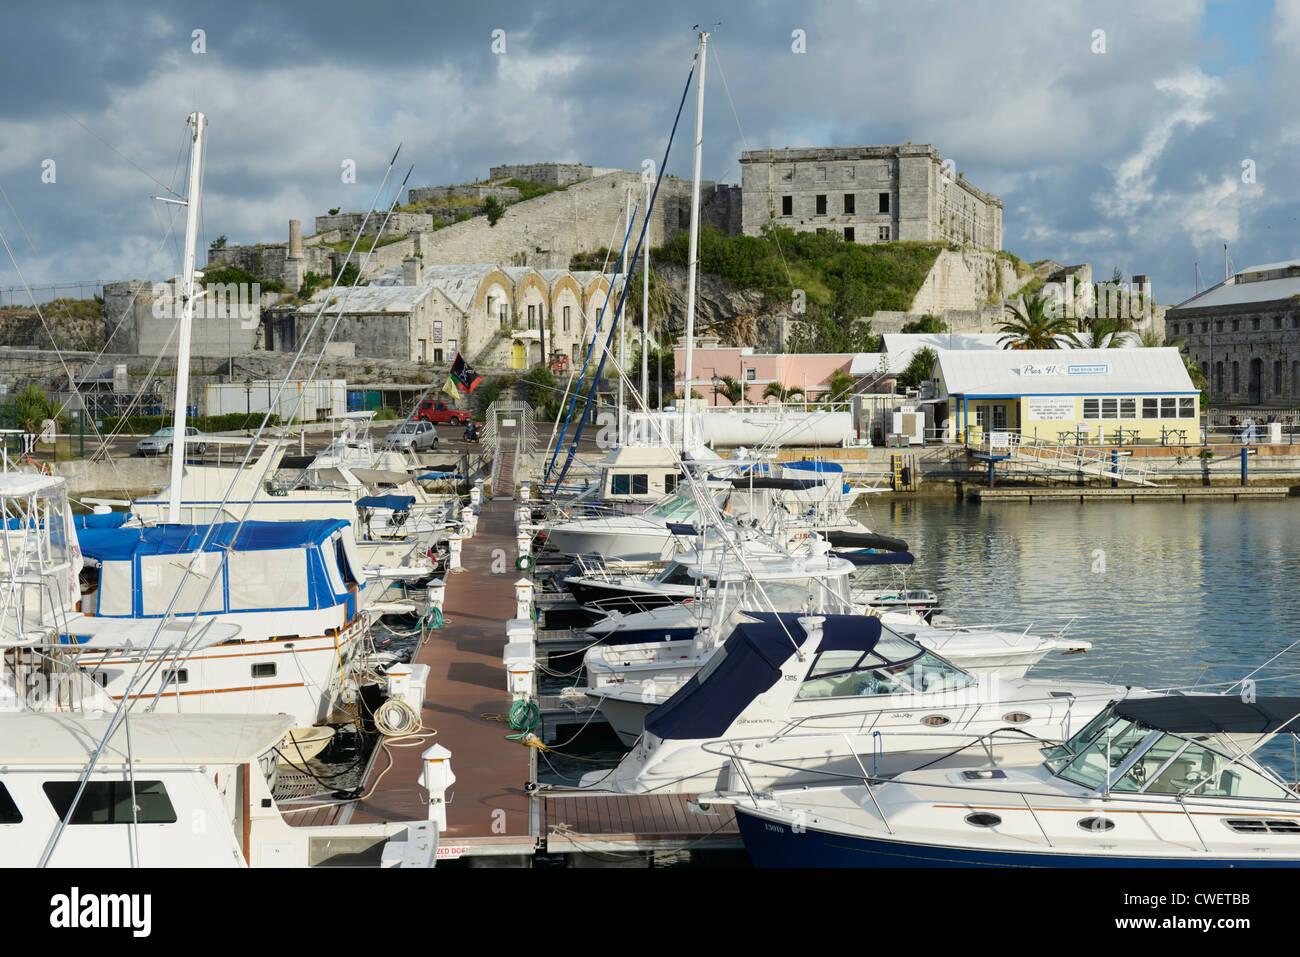 Royal Navy Dockyard Marina, Bermuda - Stock Image